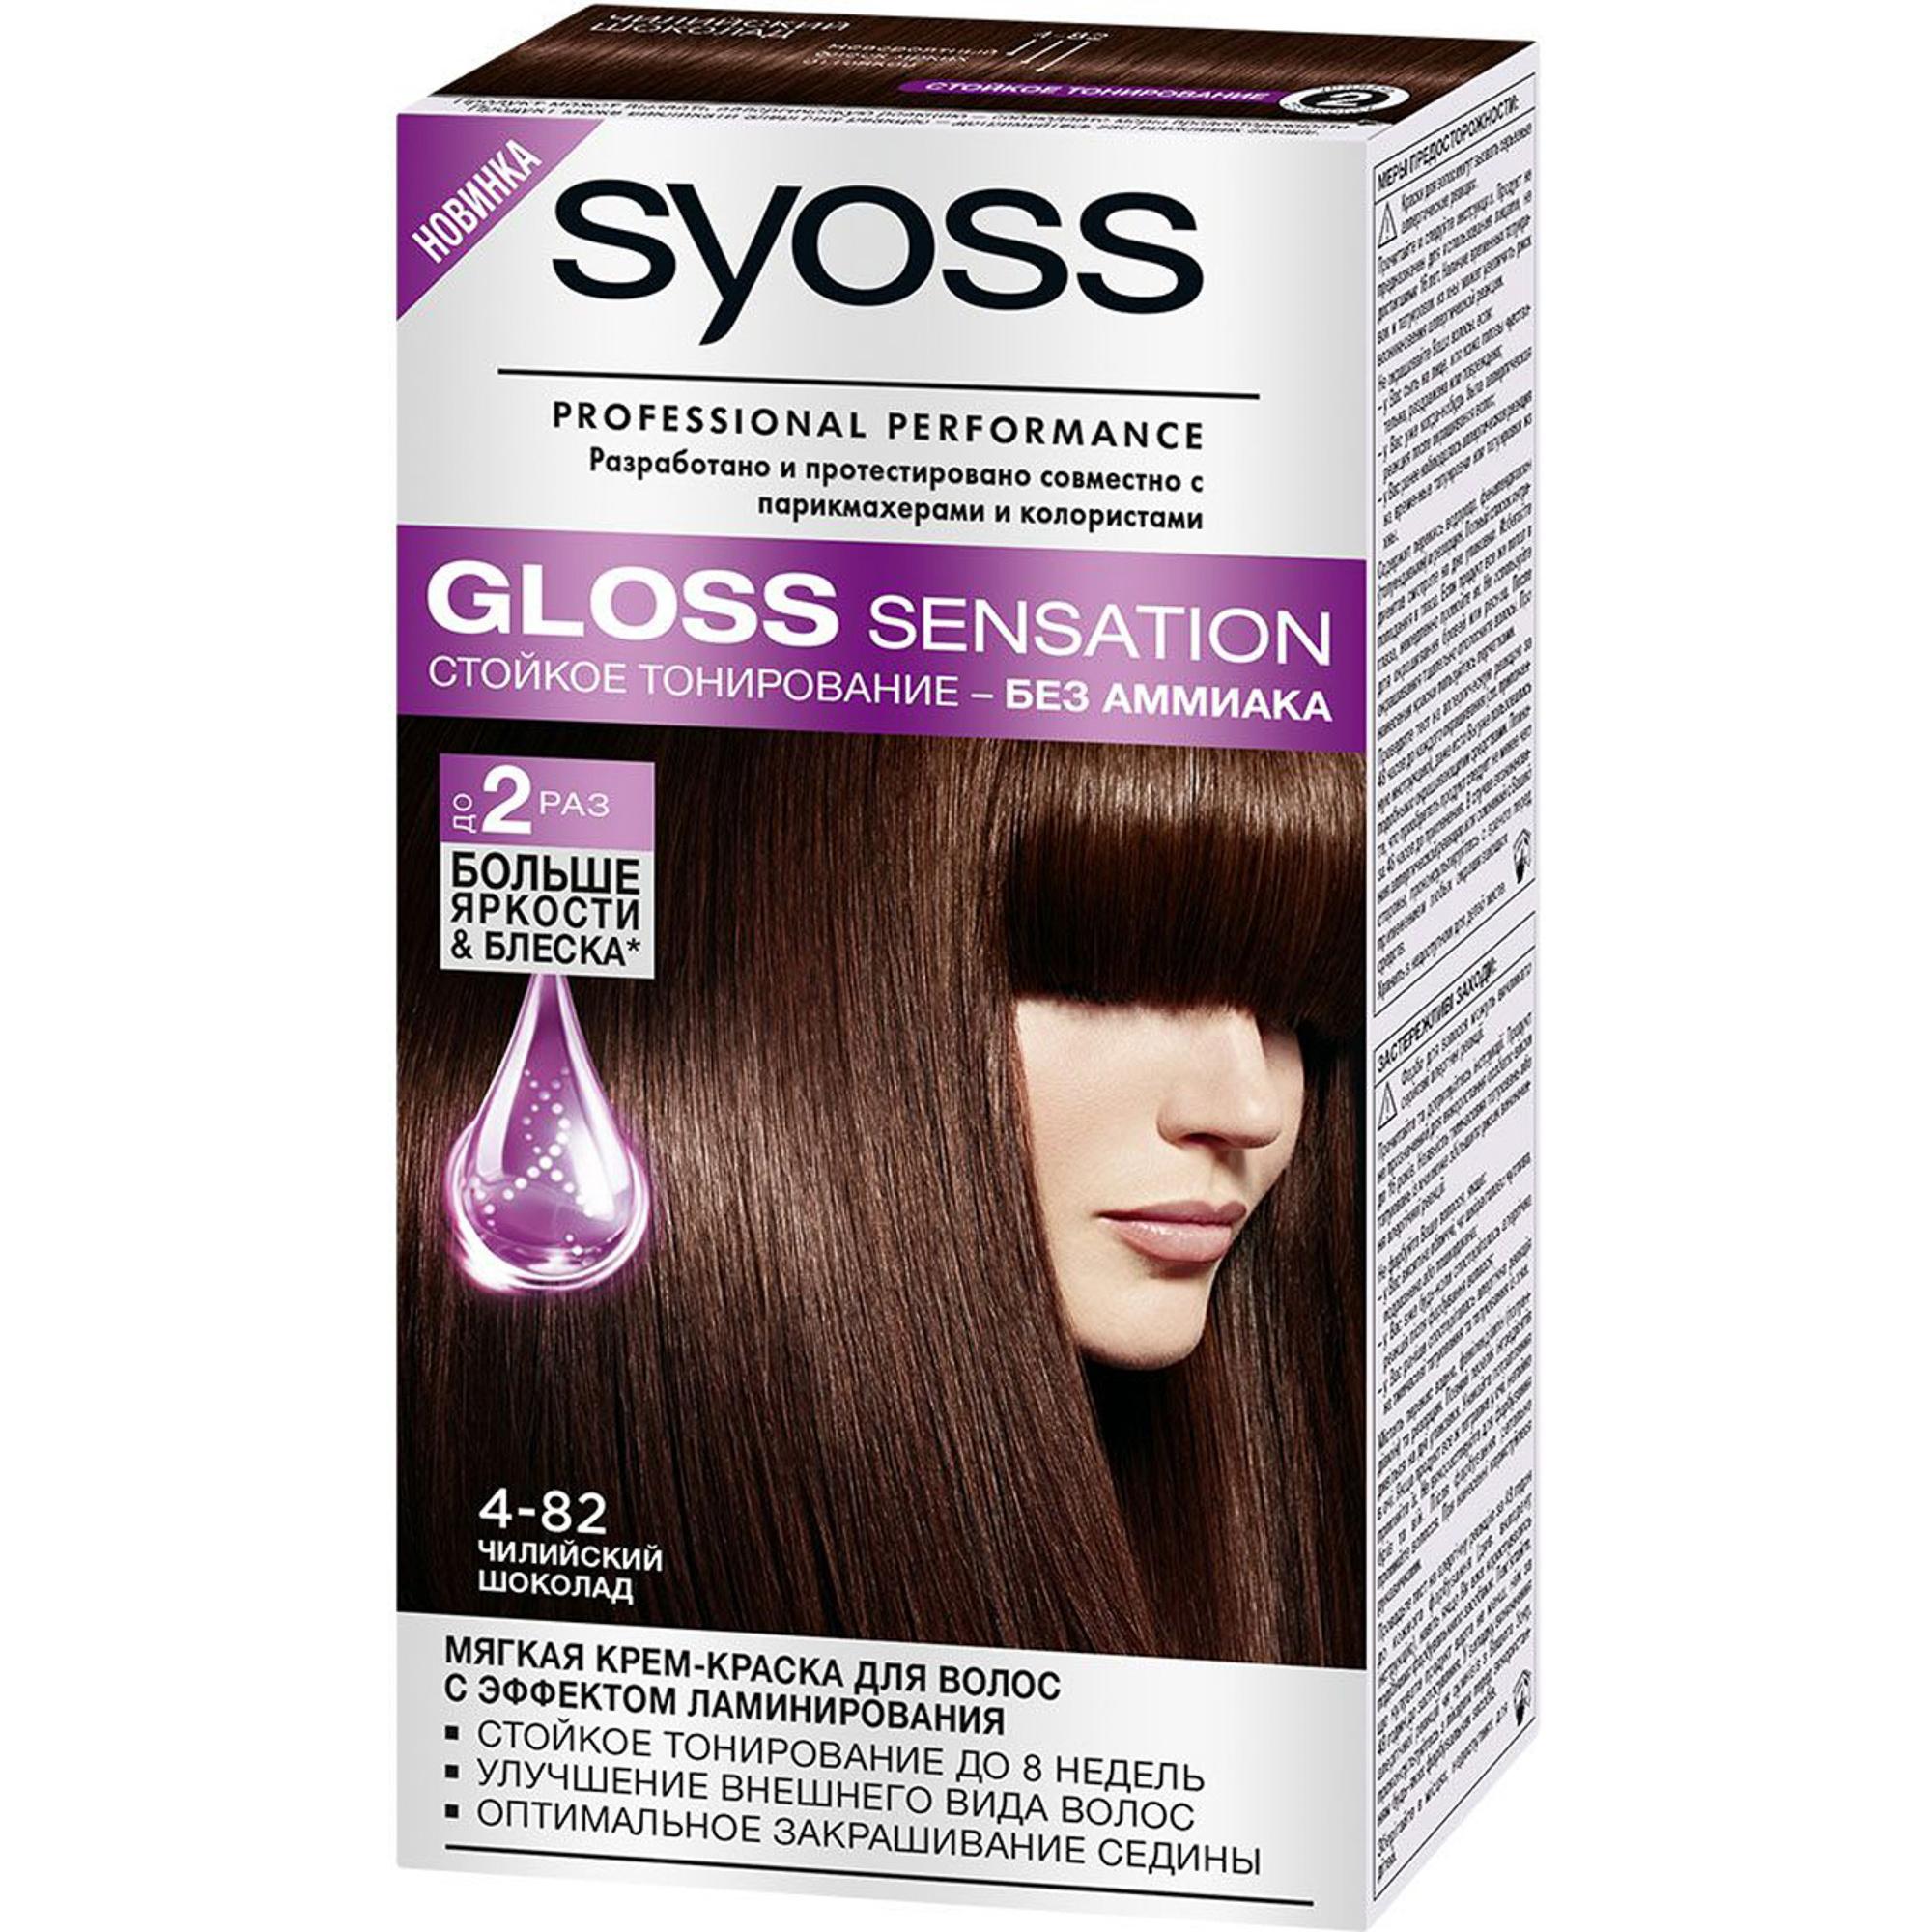 Краска для волос Syoss Gloss Sensation 4-82 Чилийский шоколад краска для волос syoss gloss sensation 10 51 белый шоколад